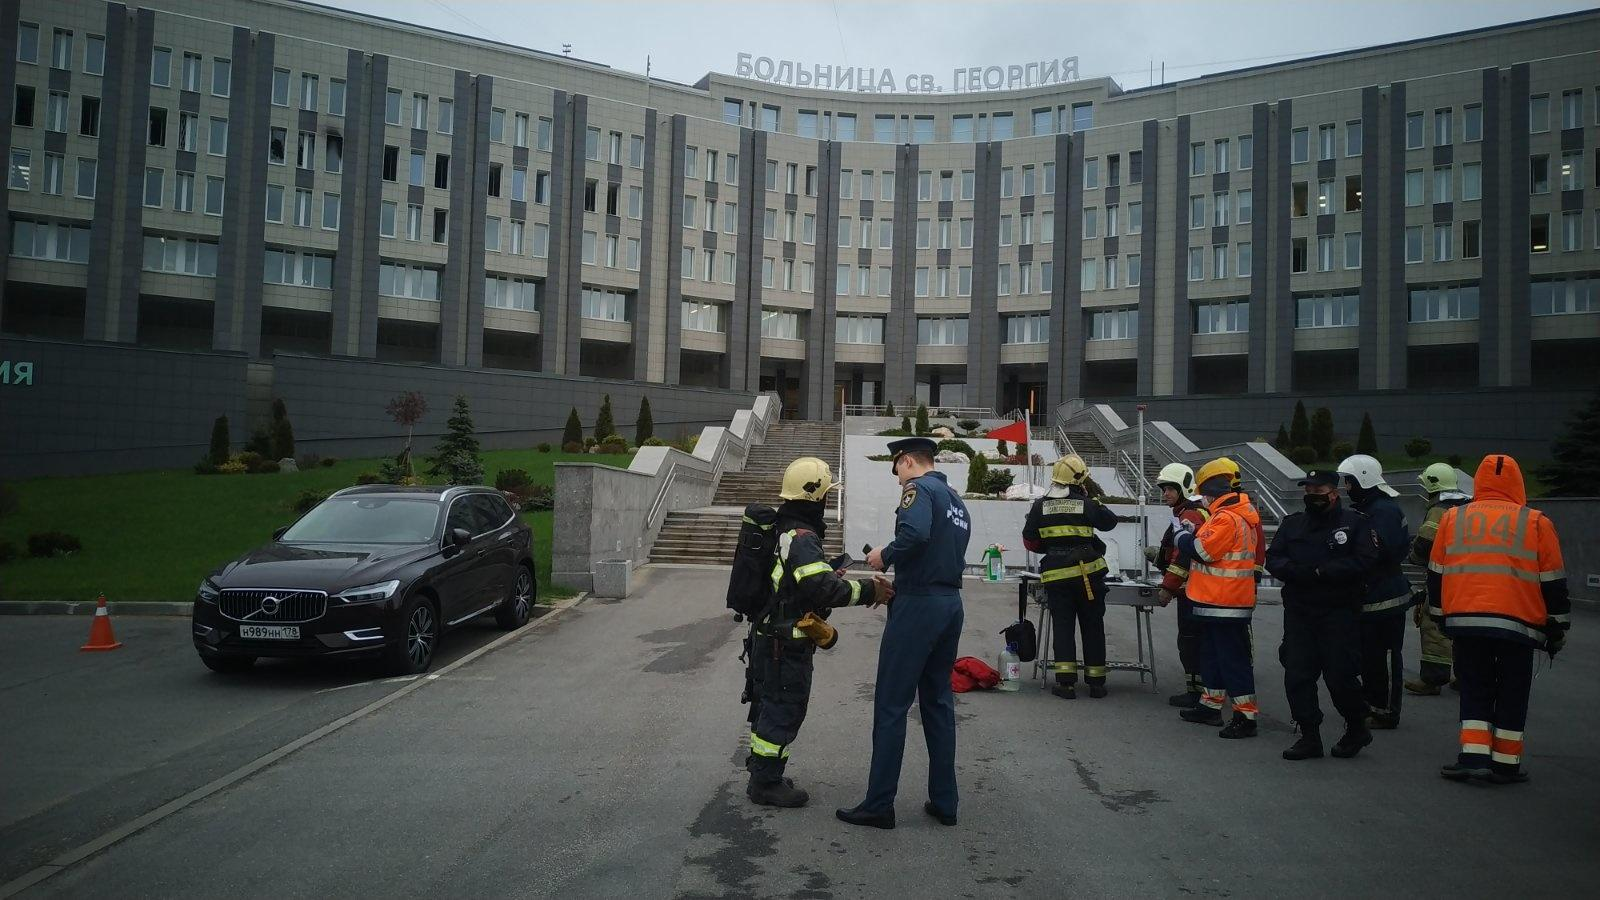 Фото © ГУ МЧС РФ по Санкт-Петербургу